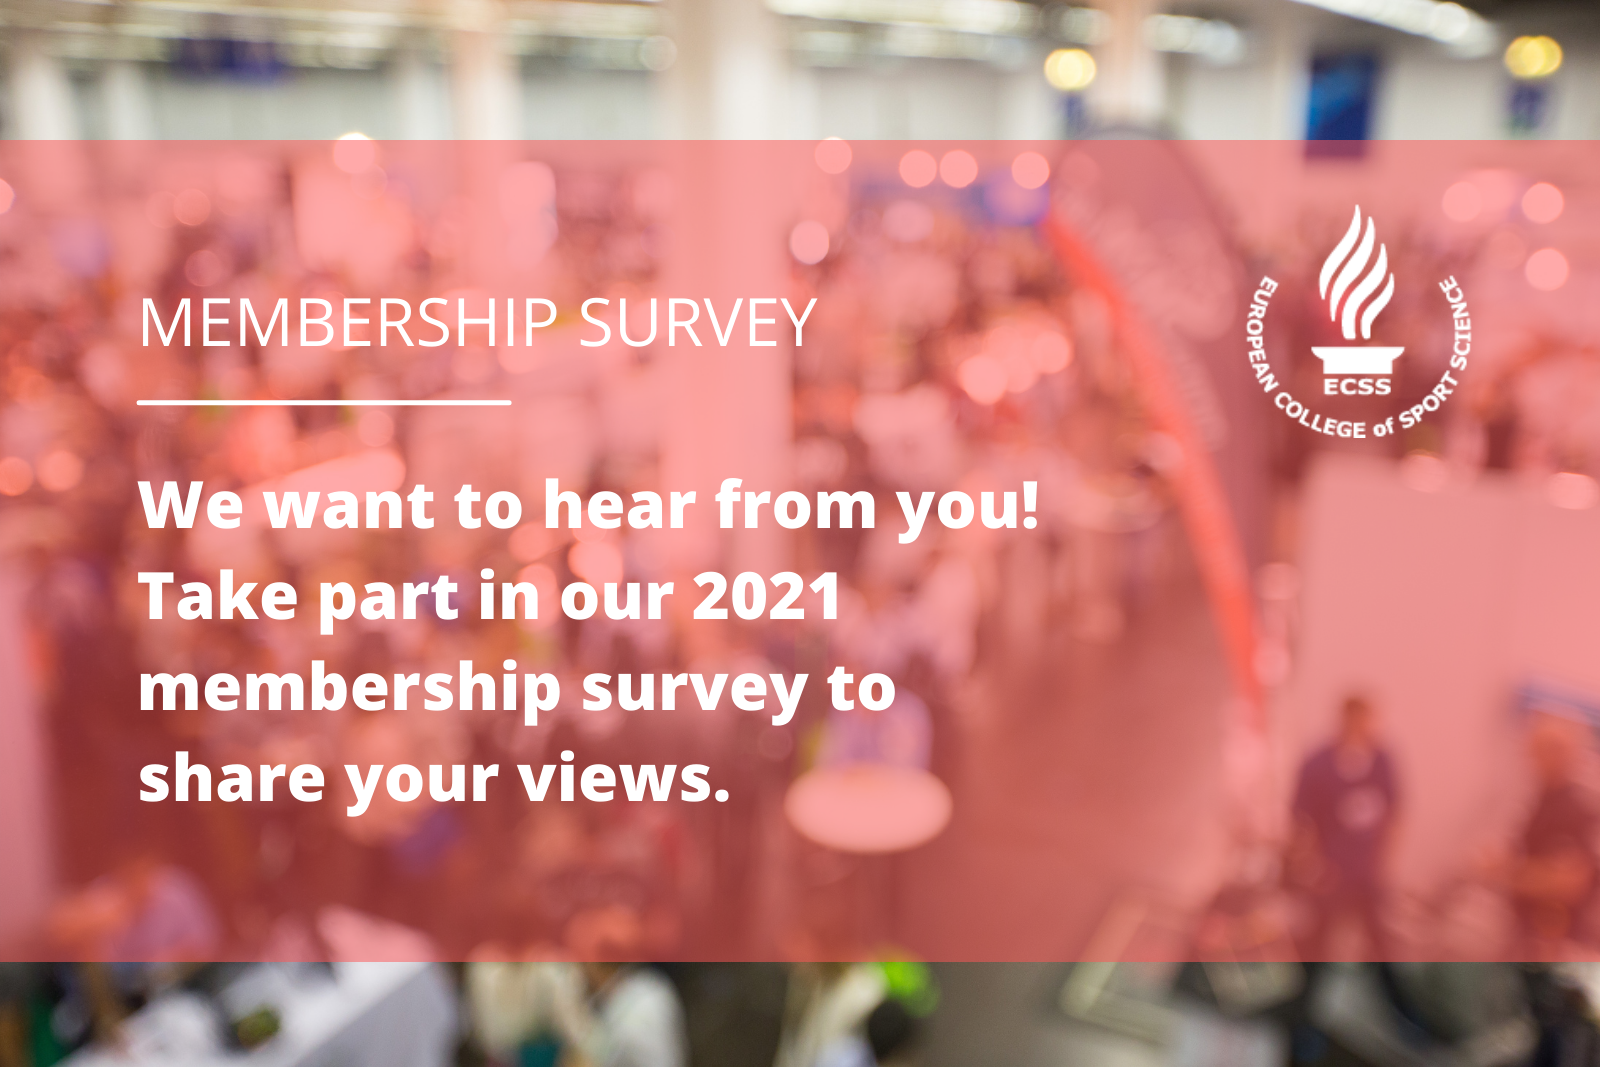 ECSS_website_banner_-_survey